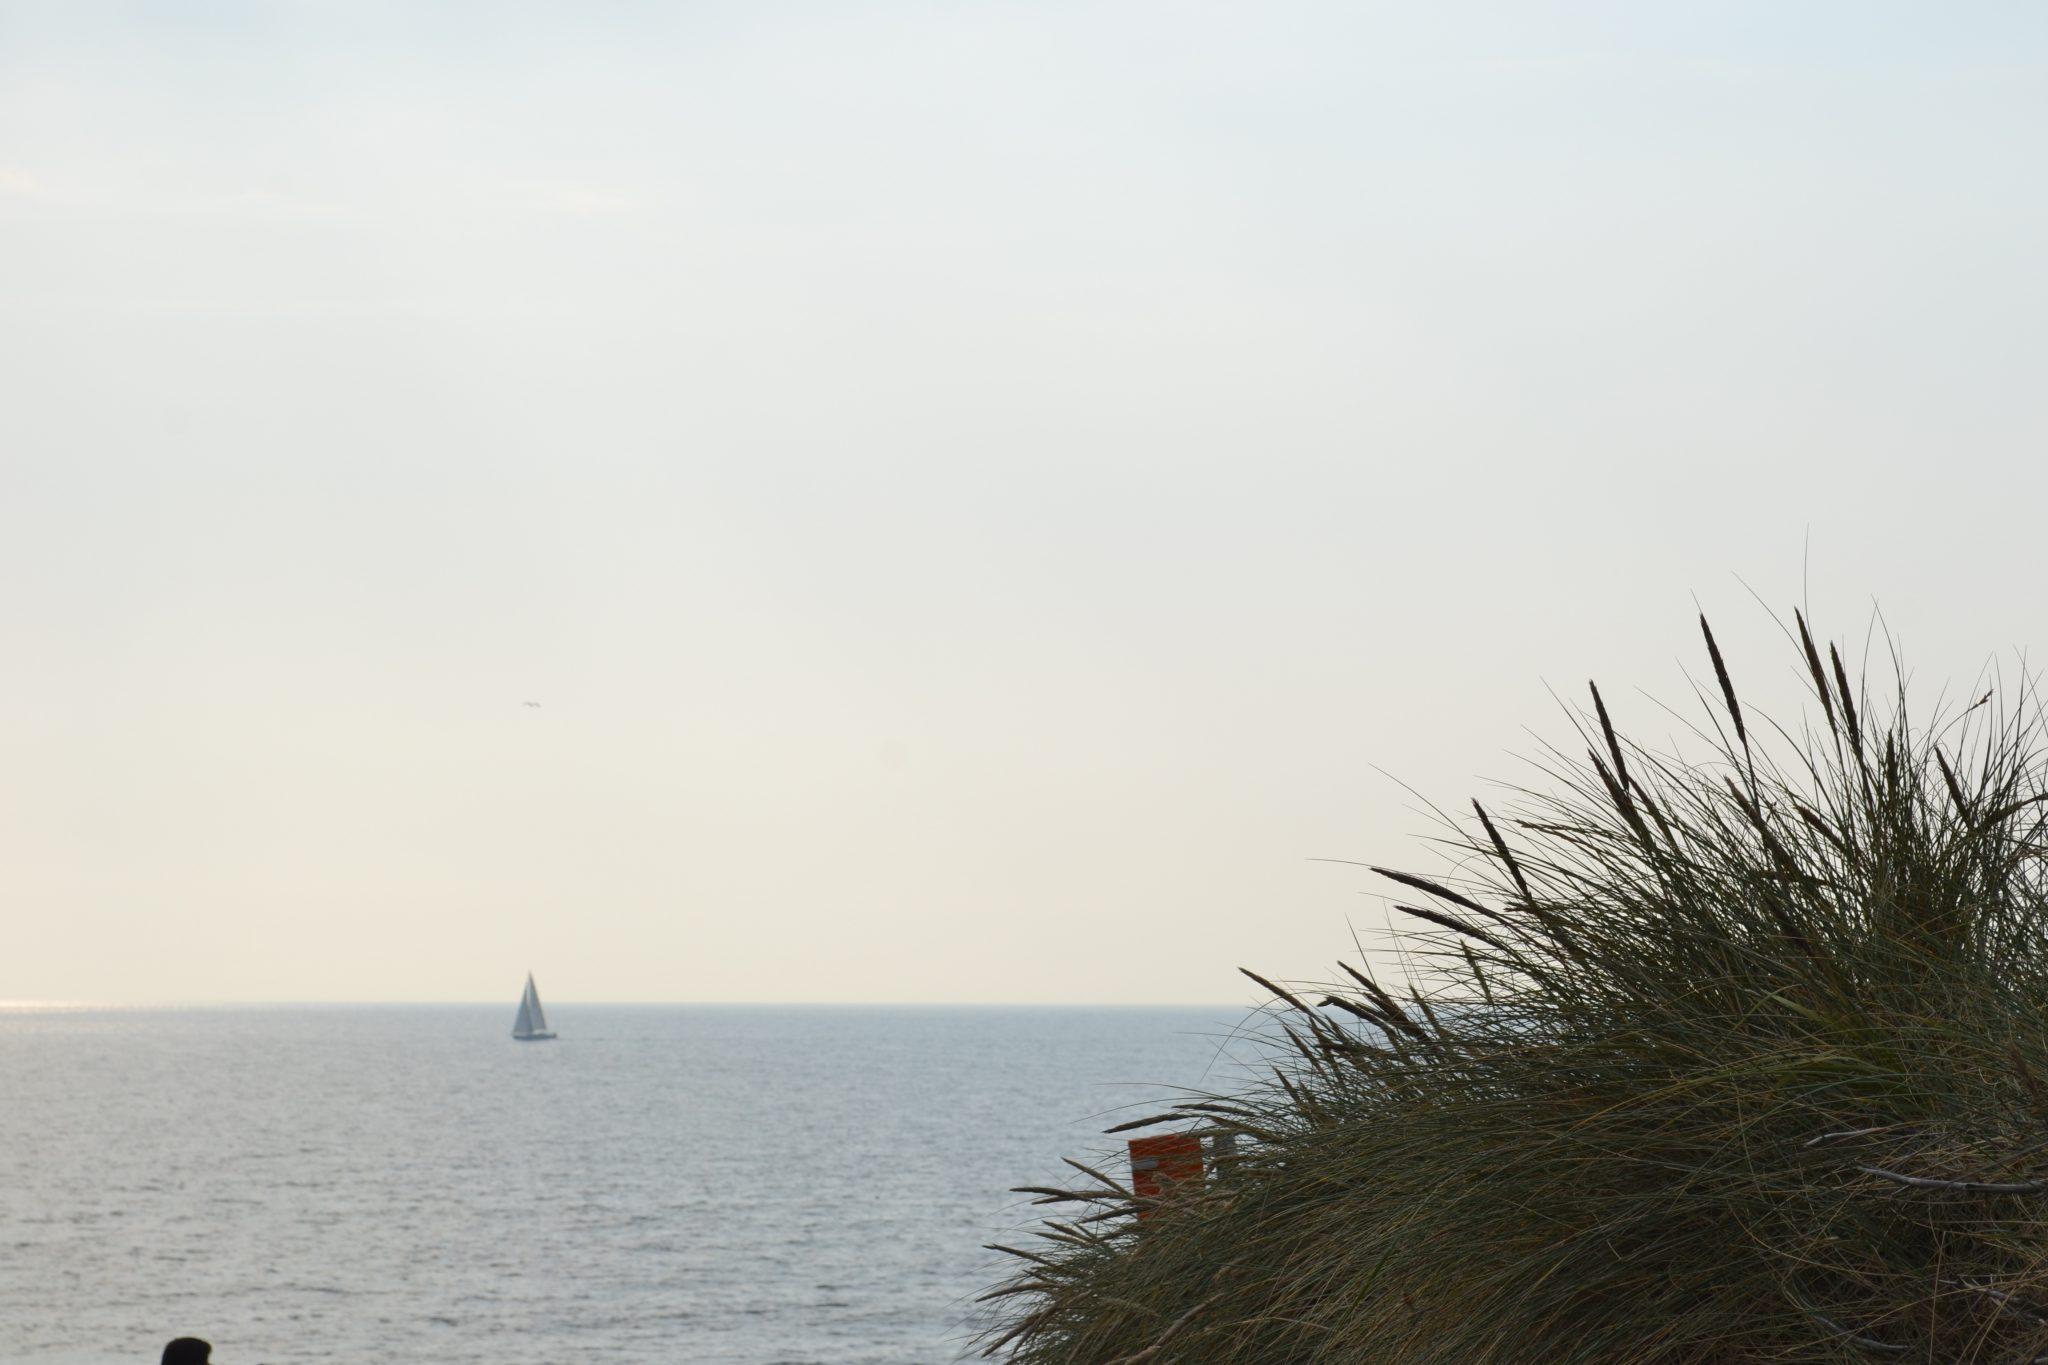 Outfit: Strand in Dänemark - DSC 0091